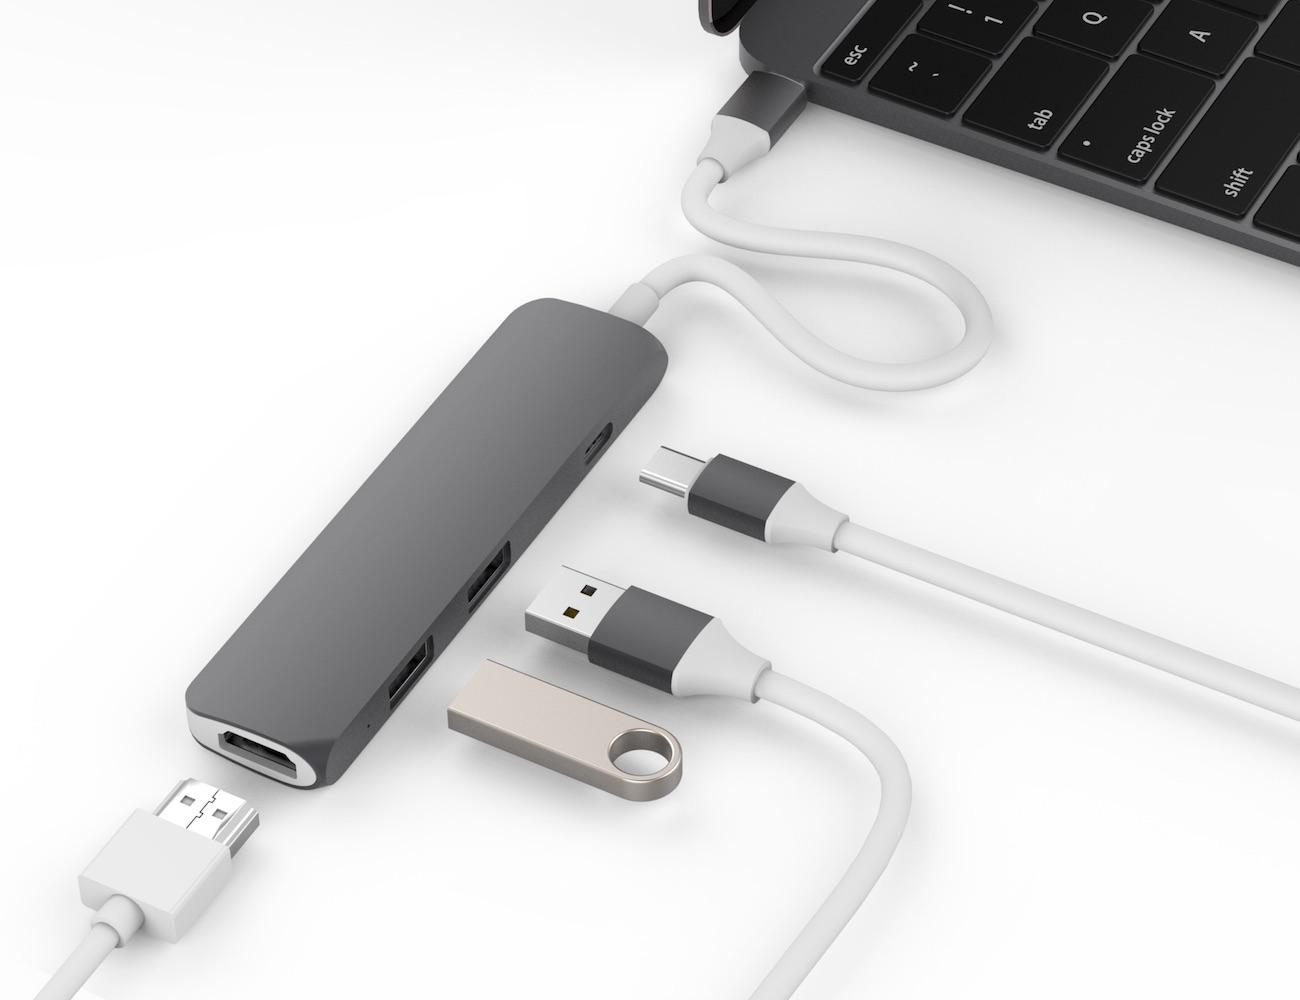 HyperDrive USB Type-C Hub » Gadget Flow